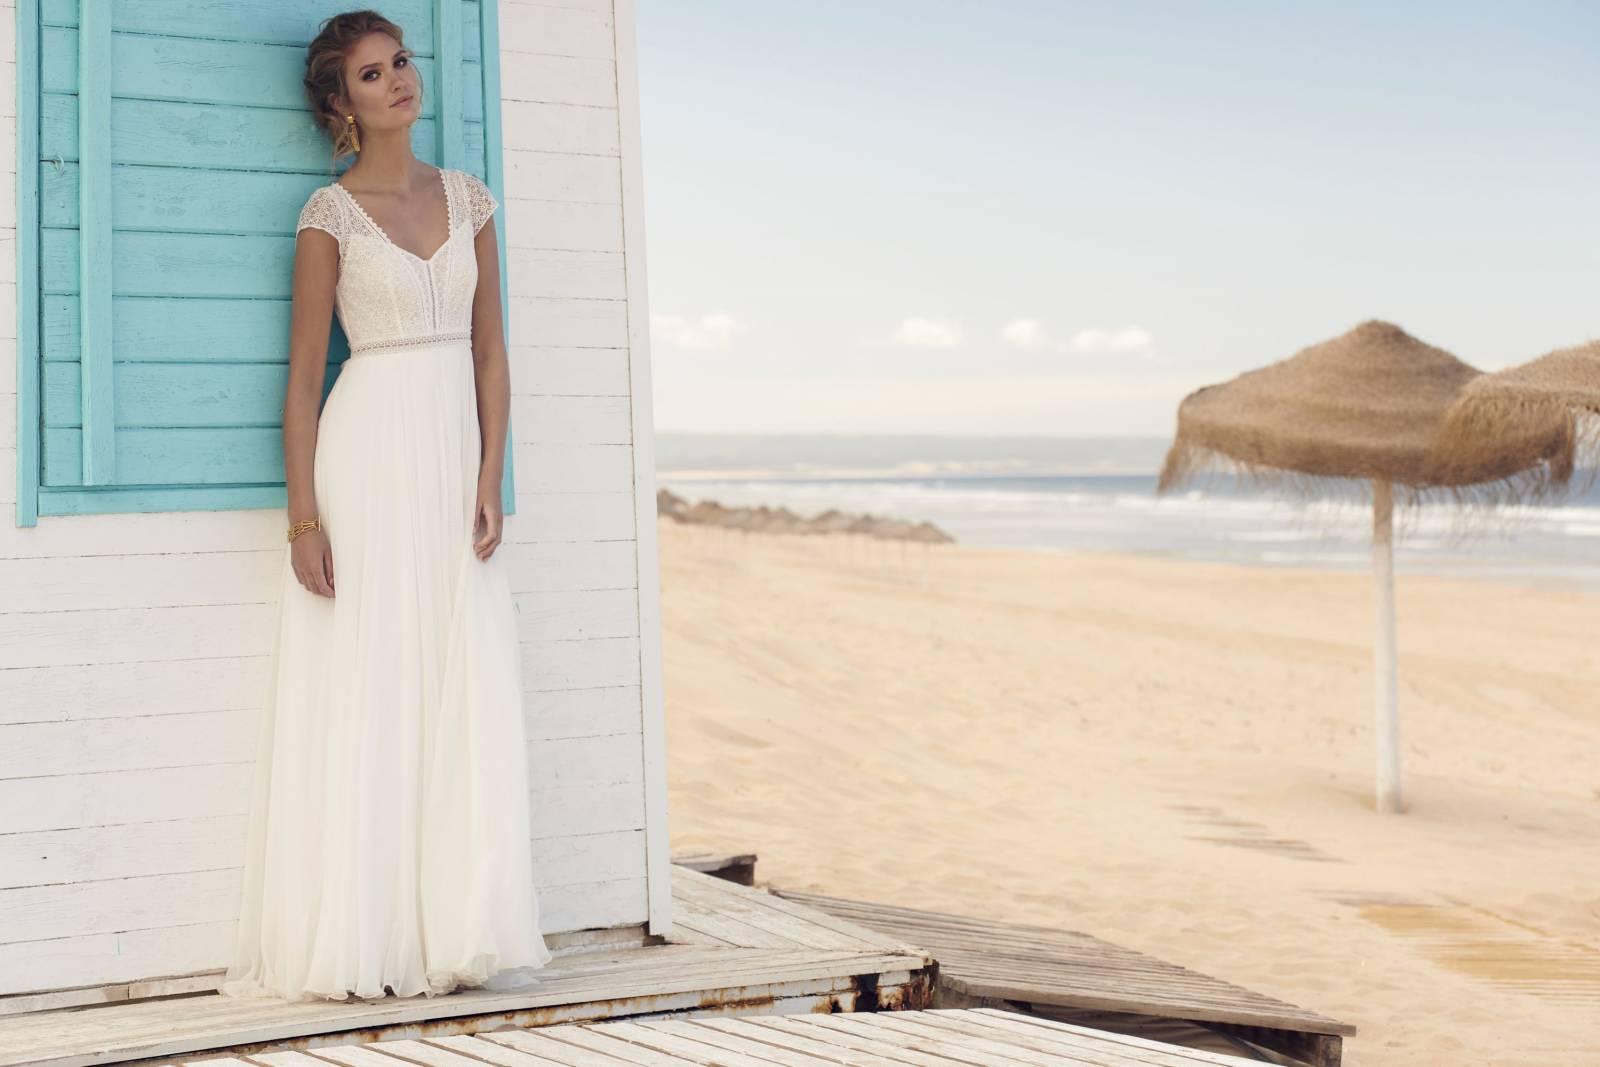 Maxim's Couture - Bruidsmode - Bruidsmodewinkel - Trouwjurk - House of Weddings - 14